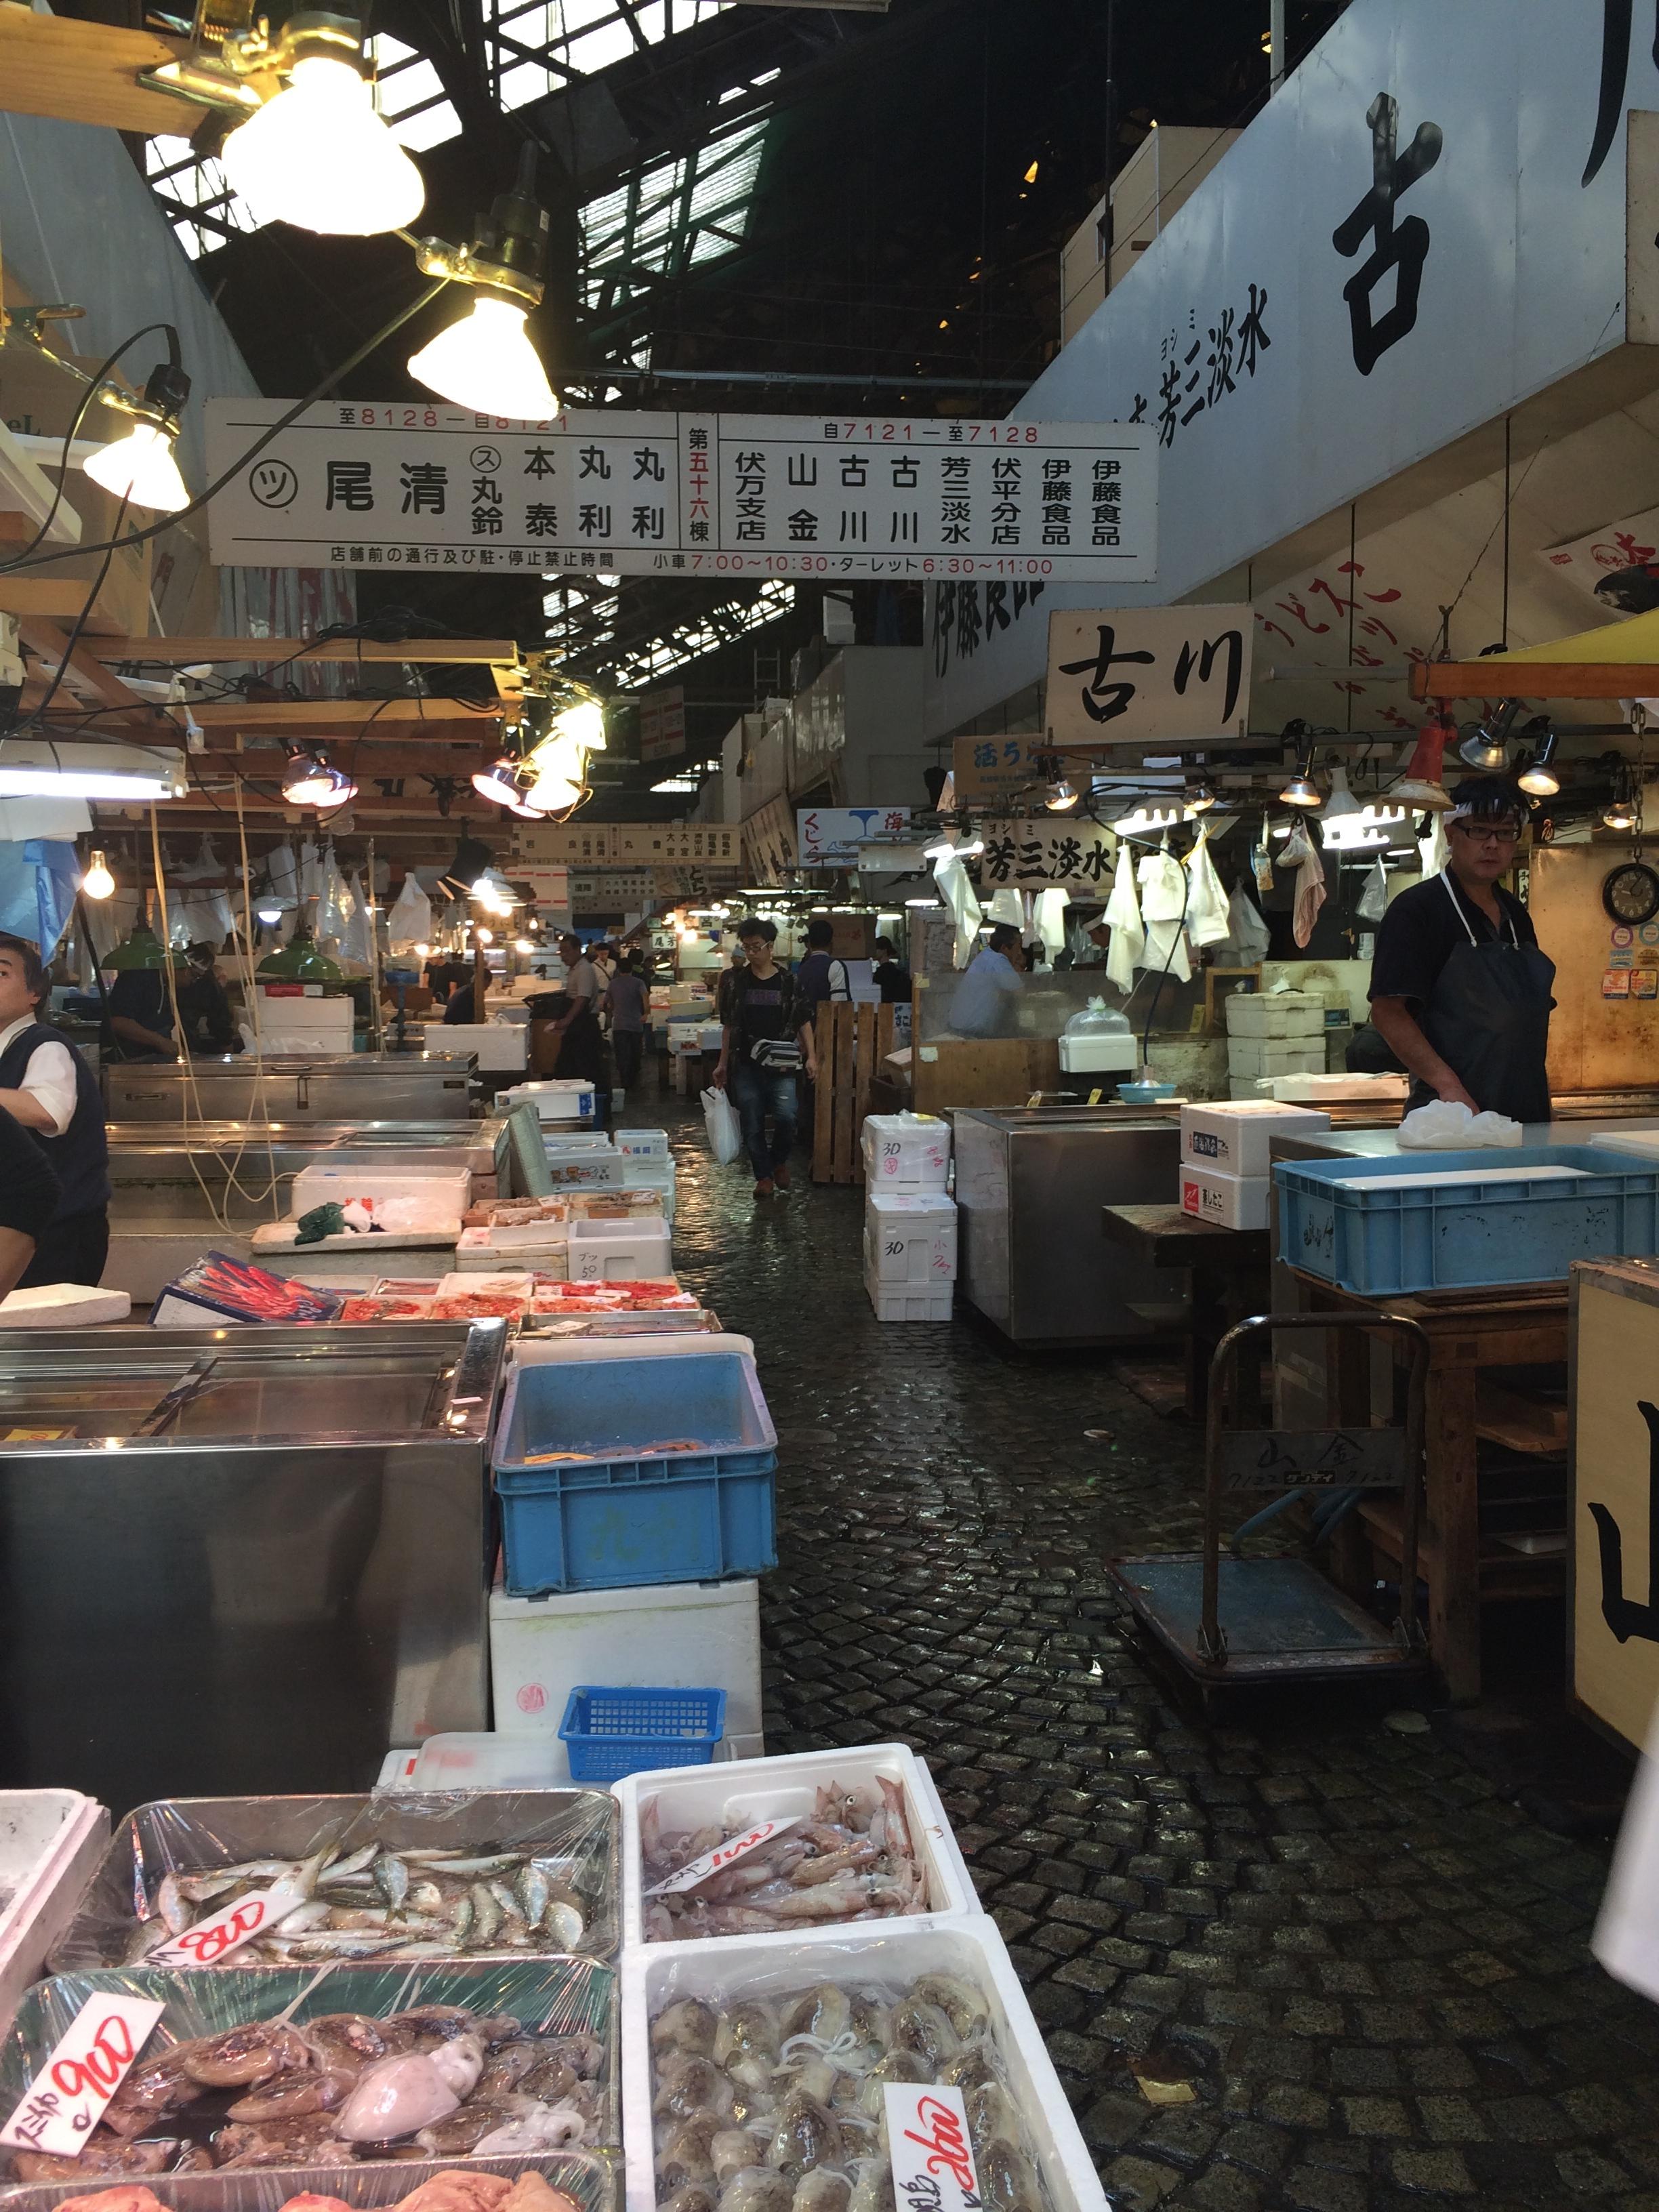 The inner market at Tsujiki